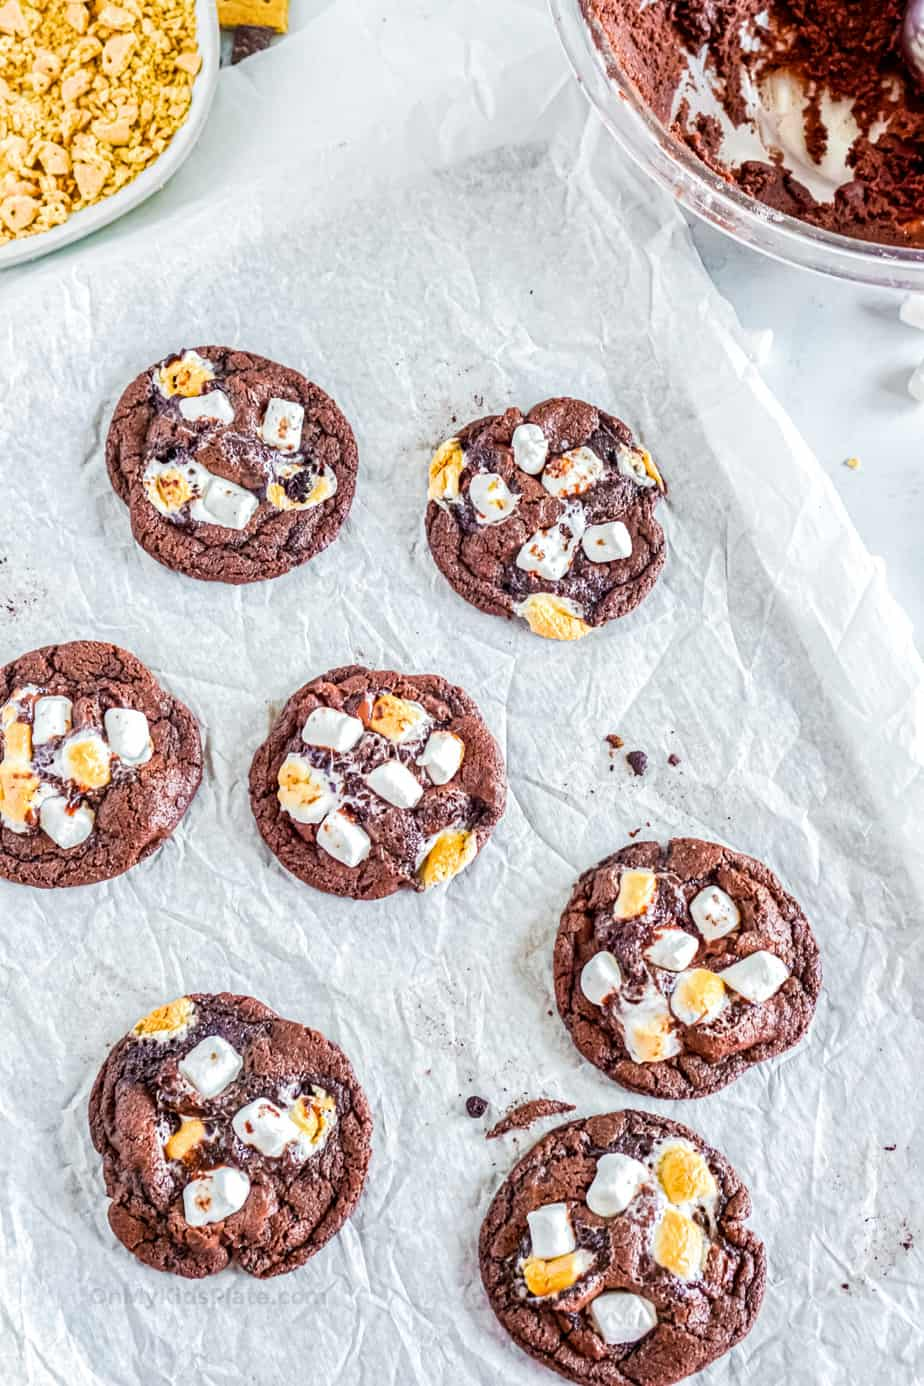 Chocolate cookies with gooey mini marshmallows on top.